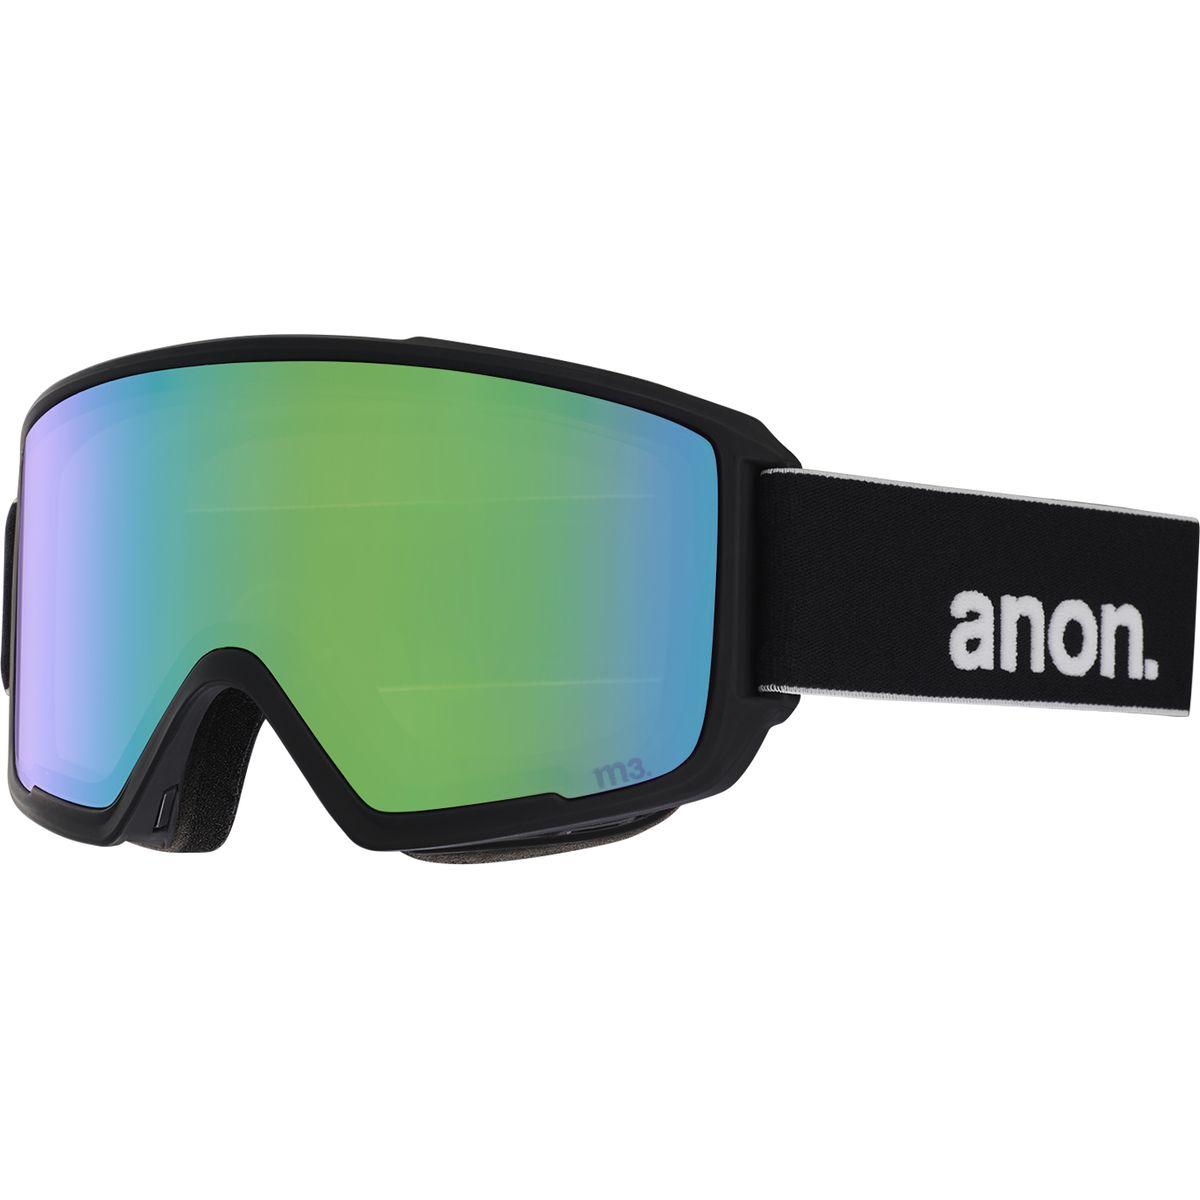 photo of a goggle